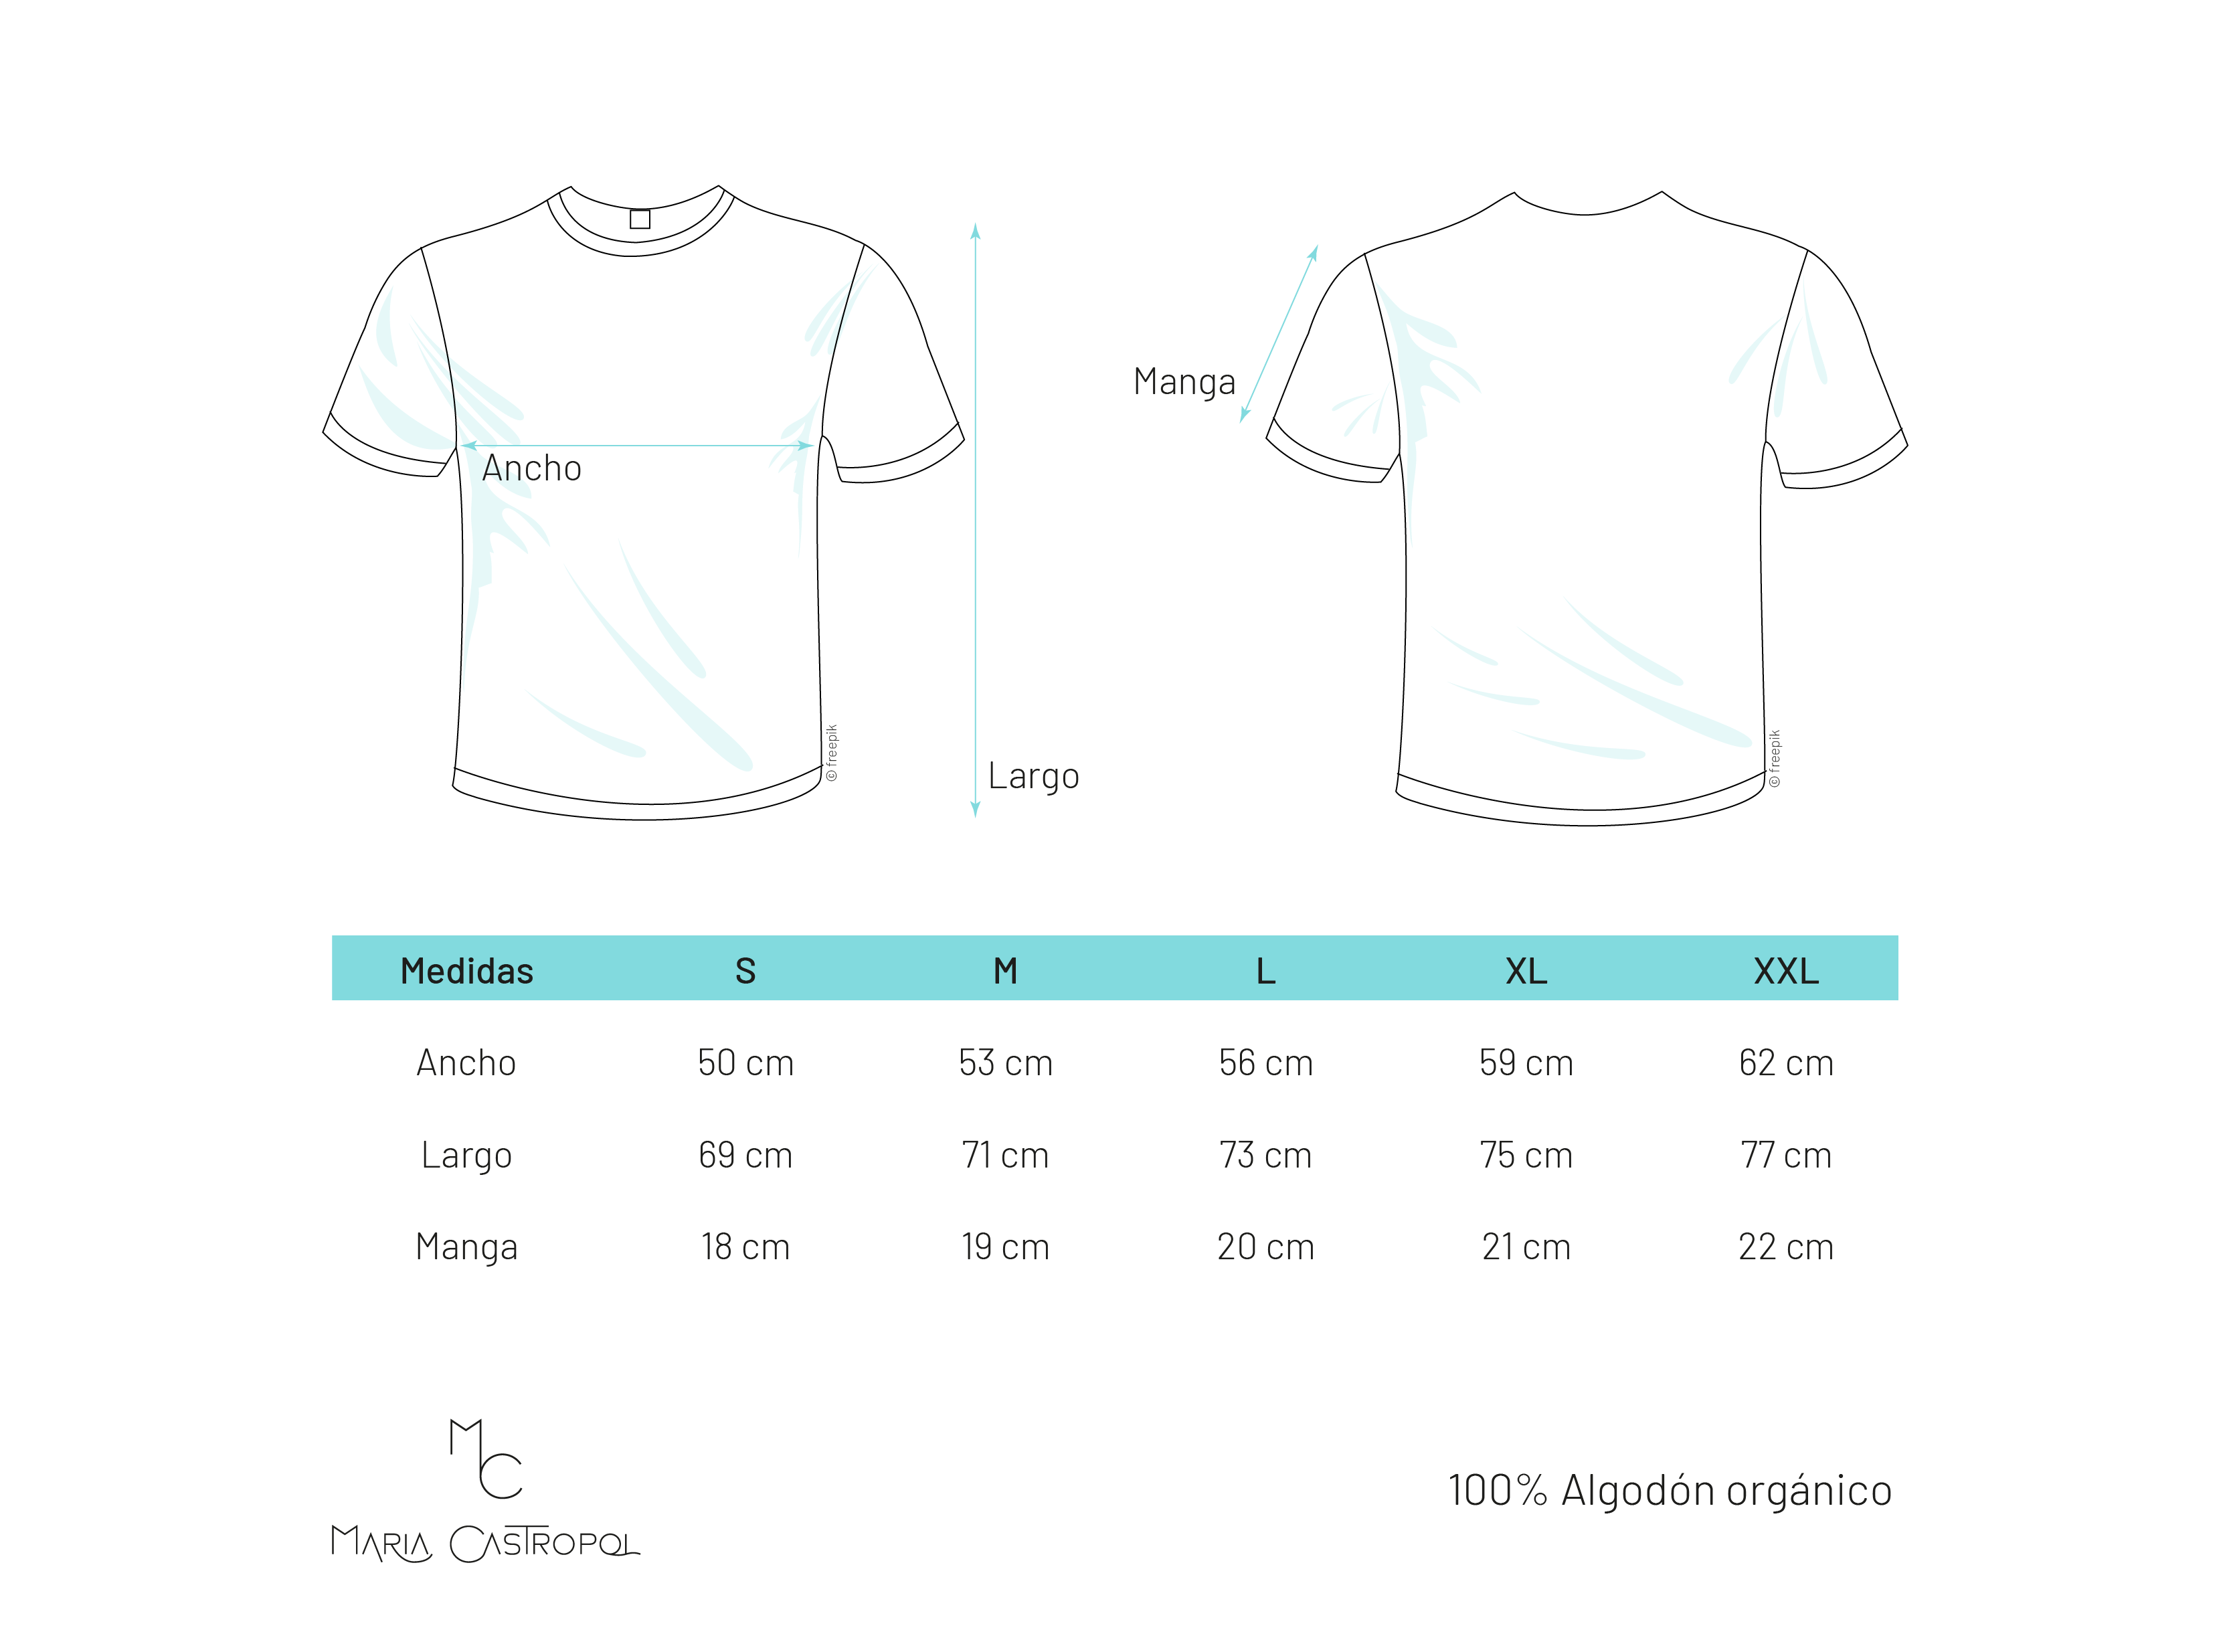 guía de tallas para camisetas